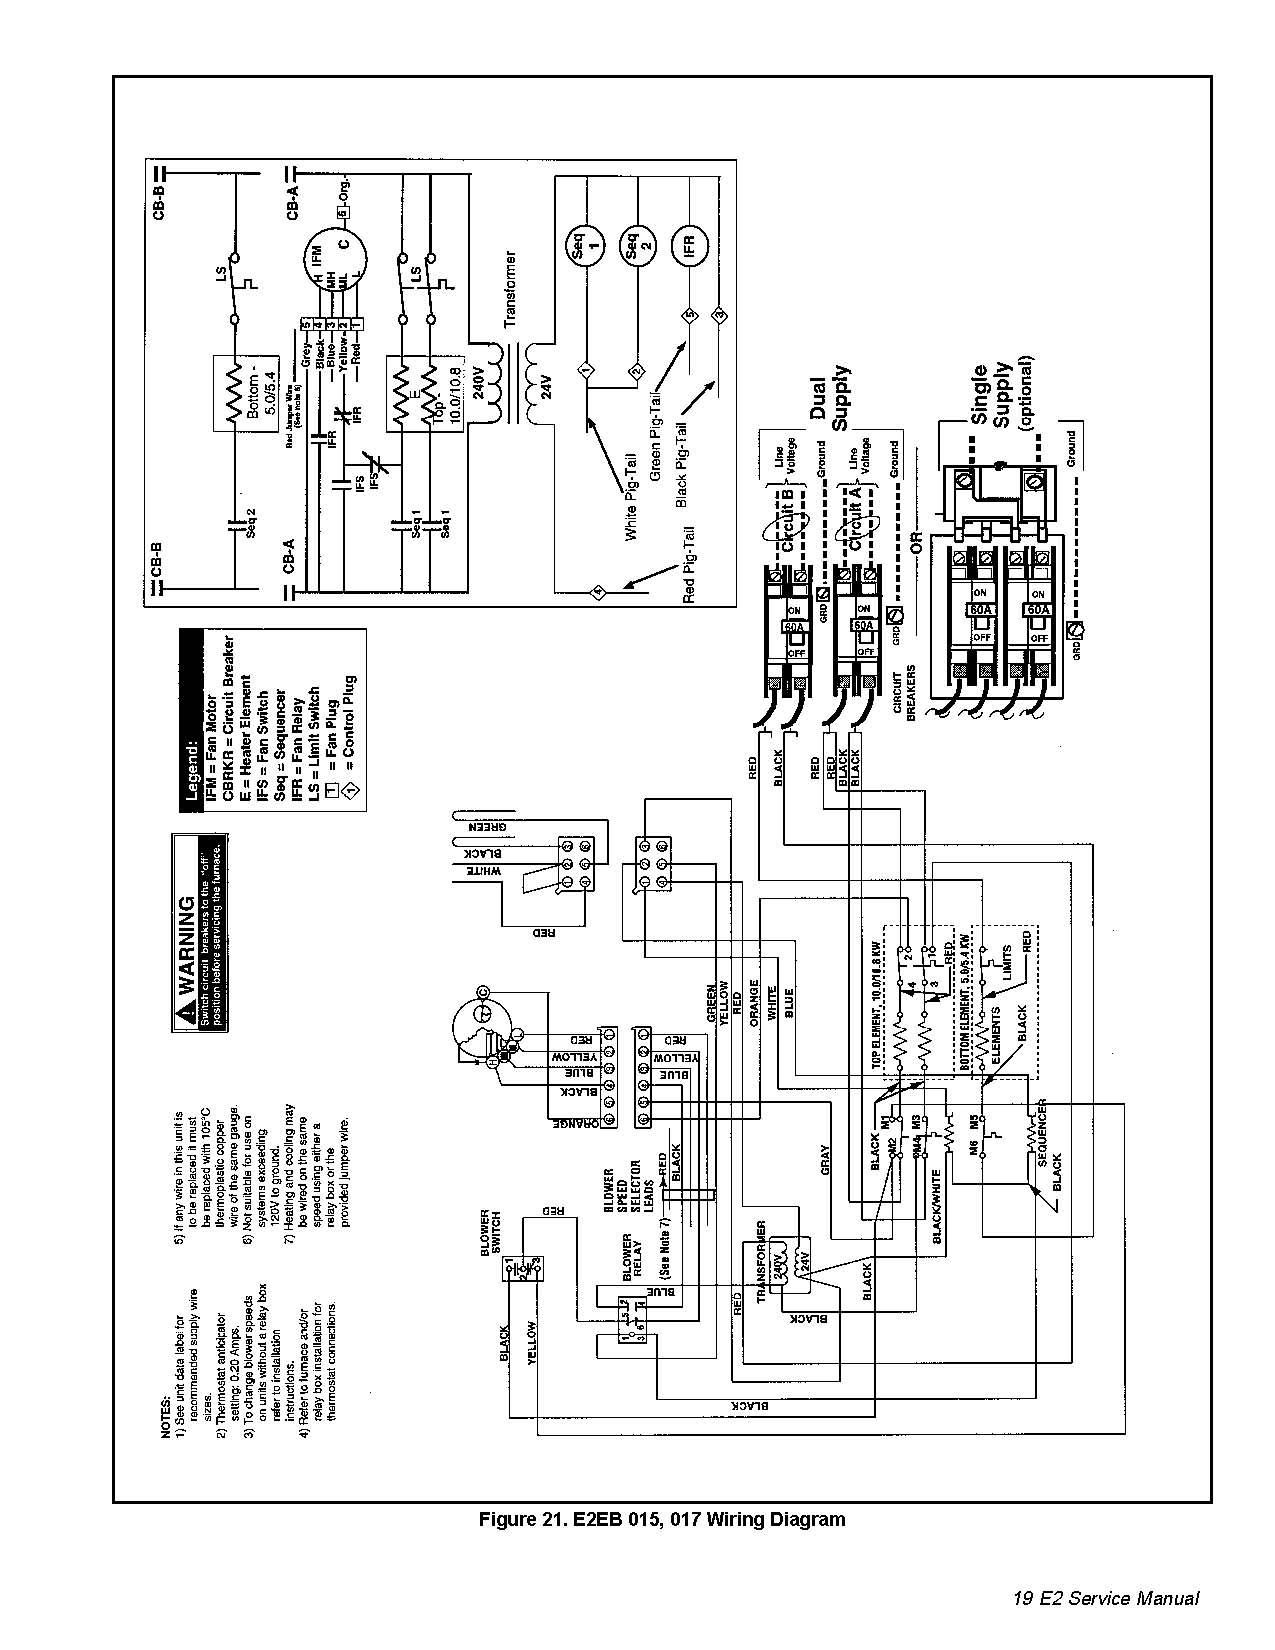 Miller Mobile Home Furnace Wiring Diagram